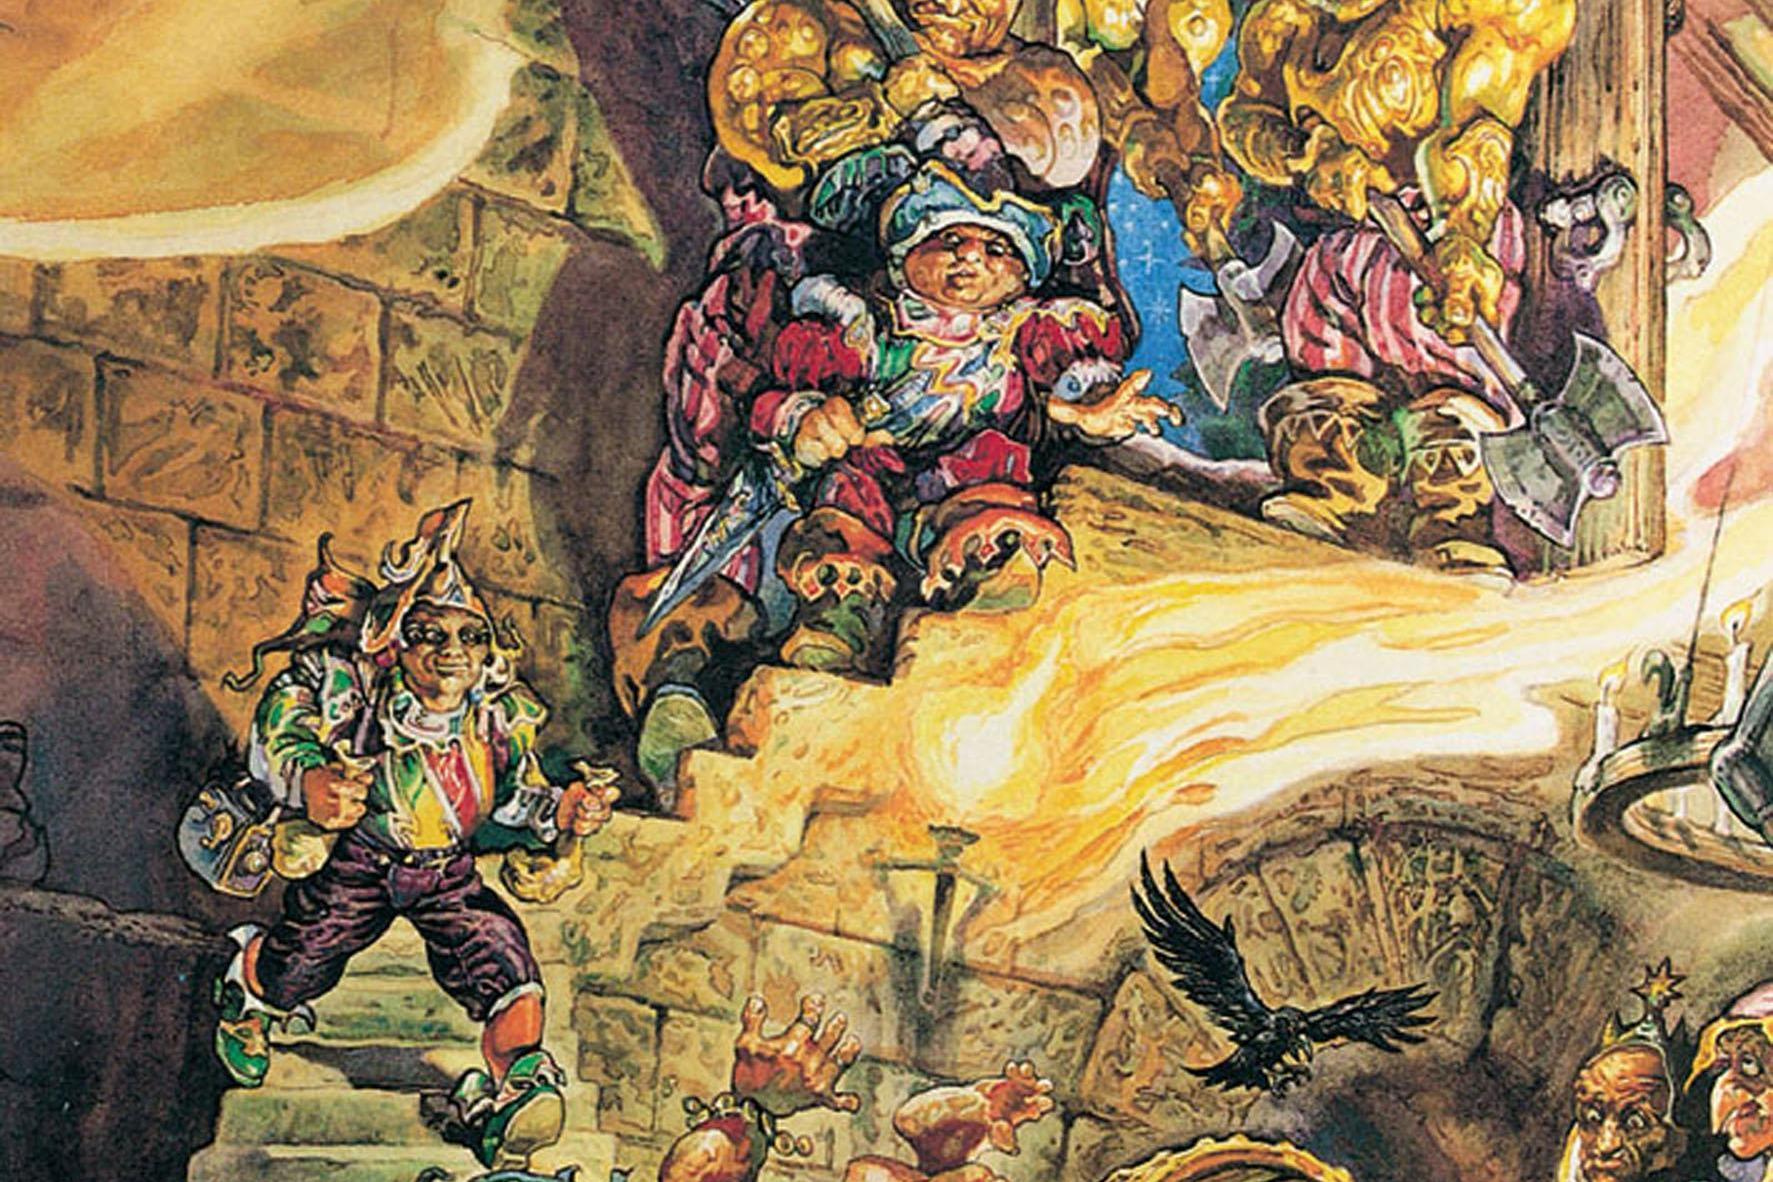 Kolor Magii, Terry Pratchett